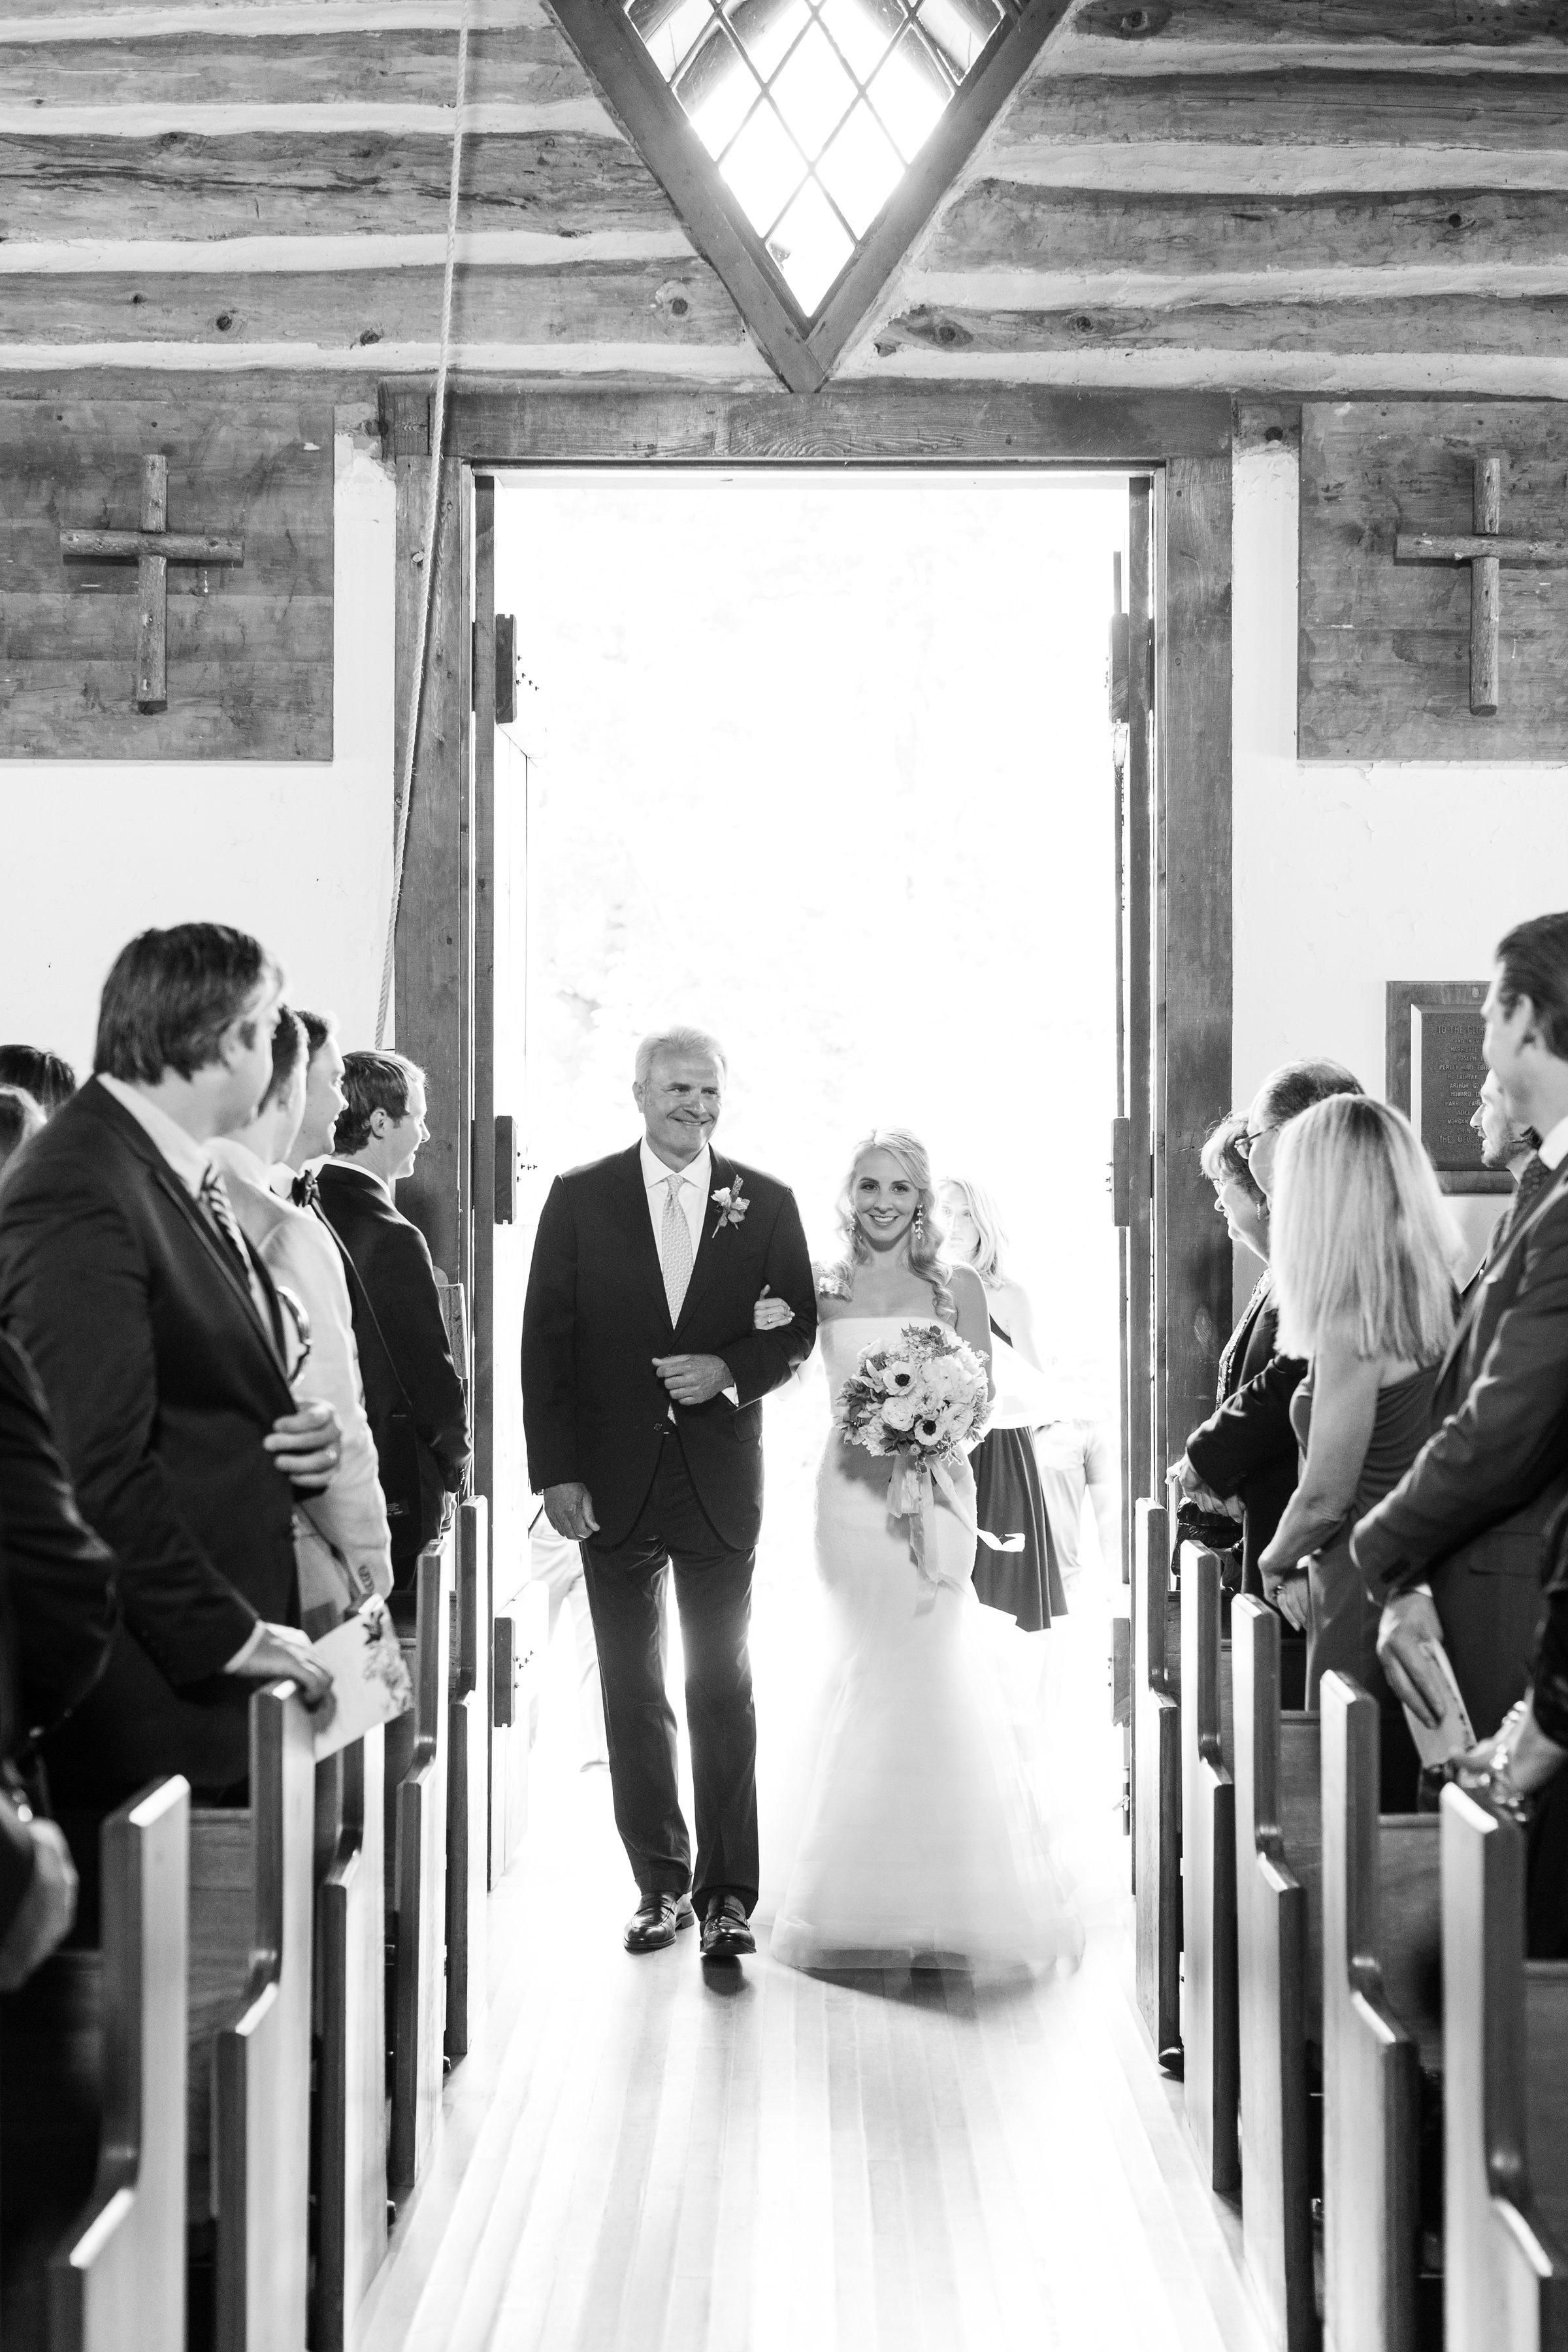 Coffman+Wedding+Ceremony-59.jpg